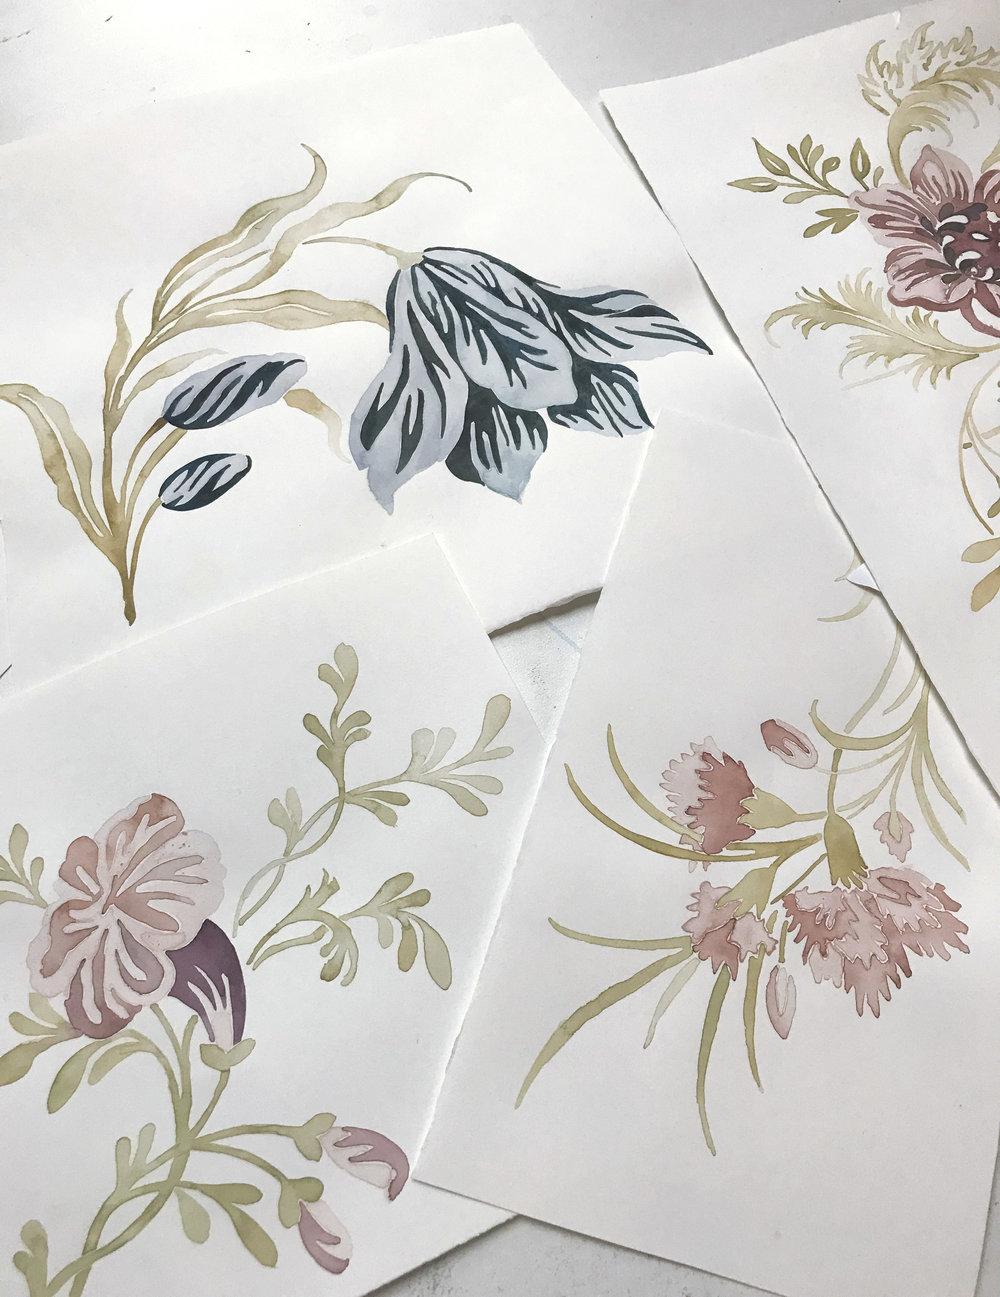 Watercolor Floral process 2